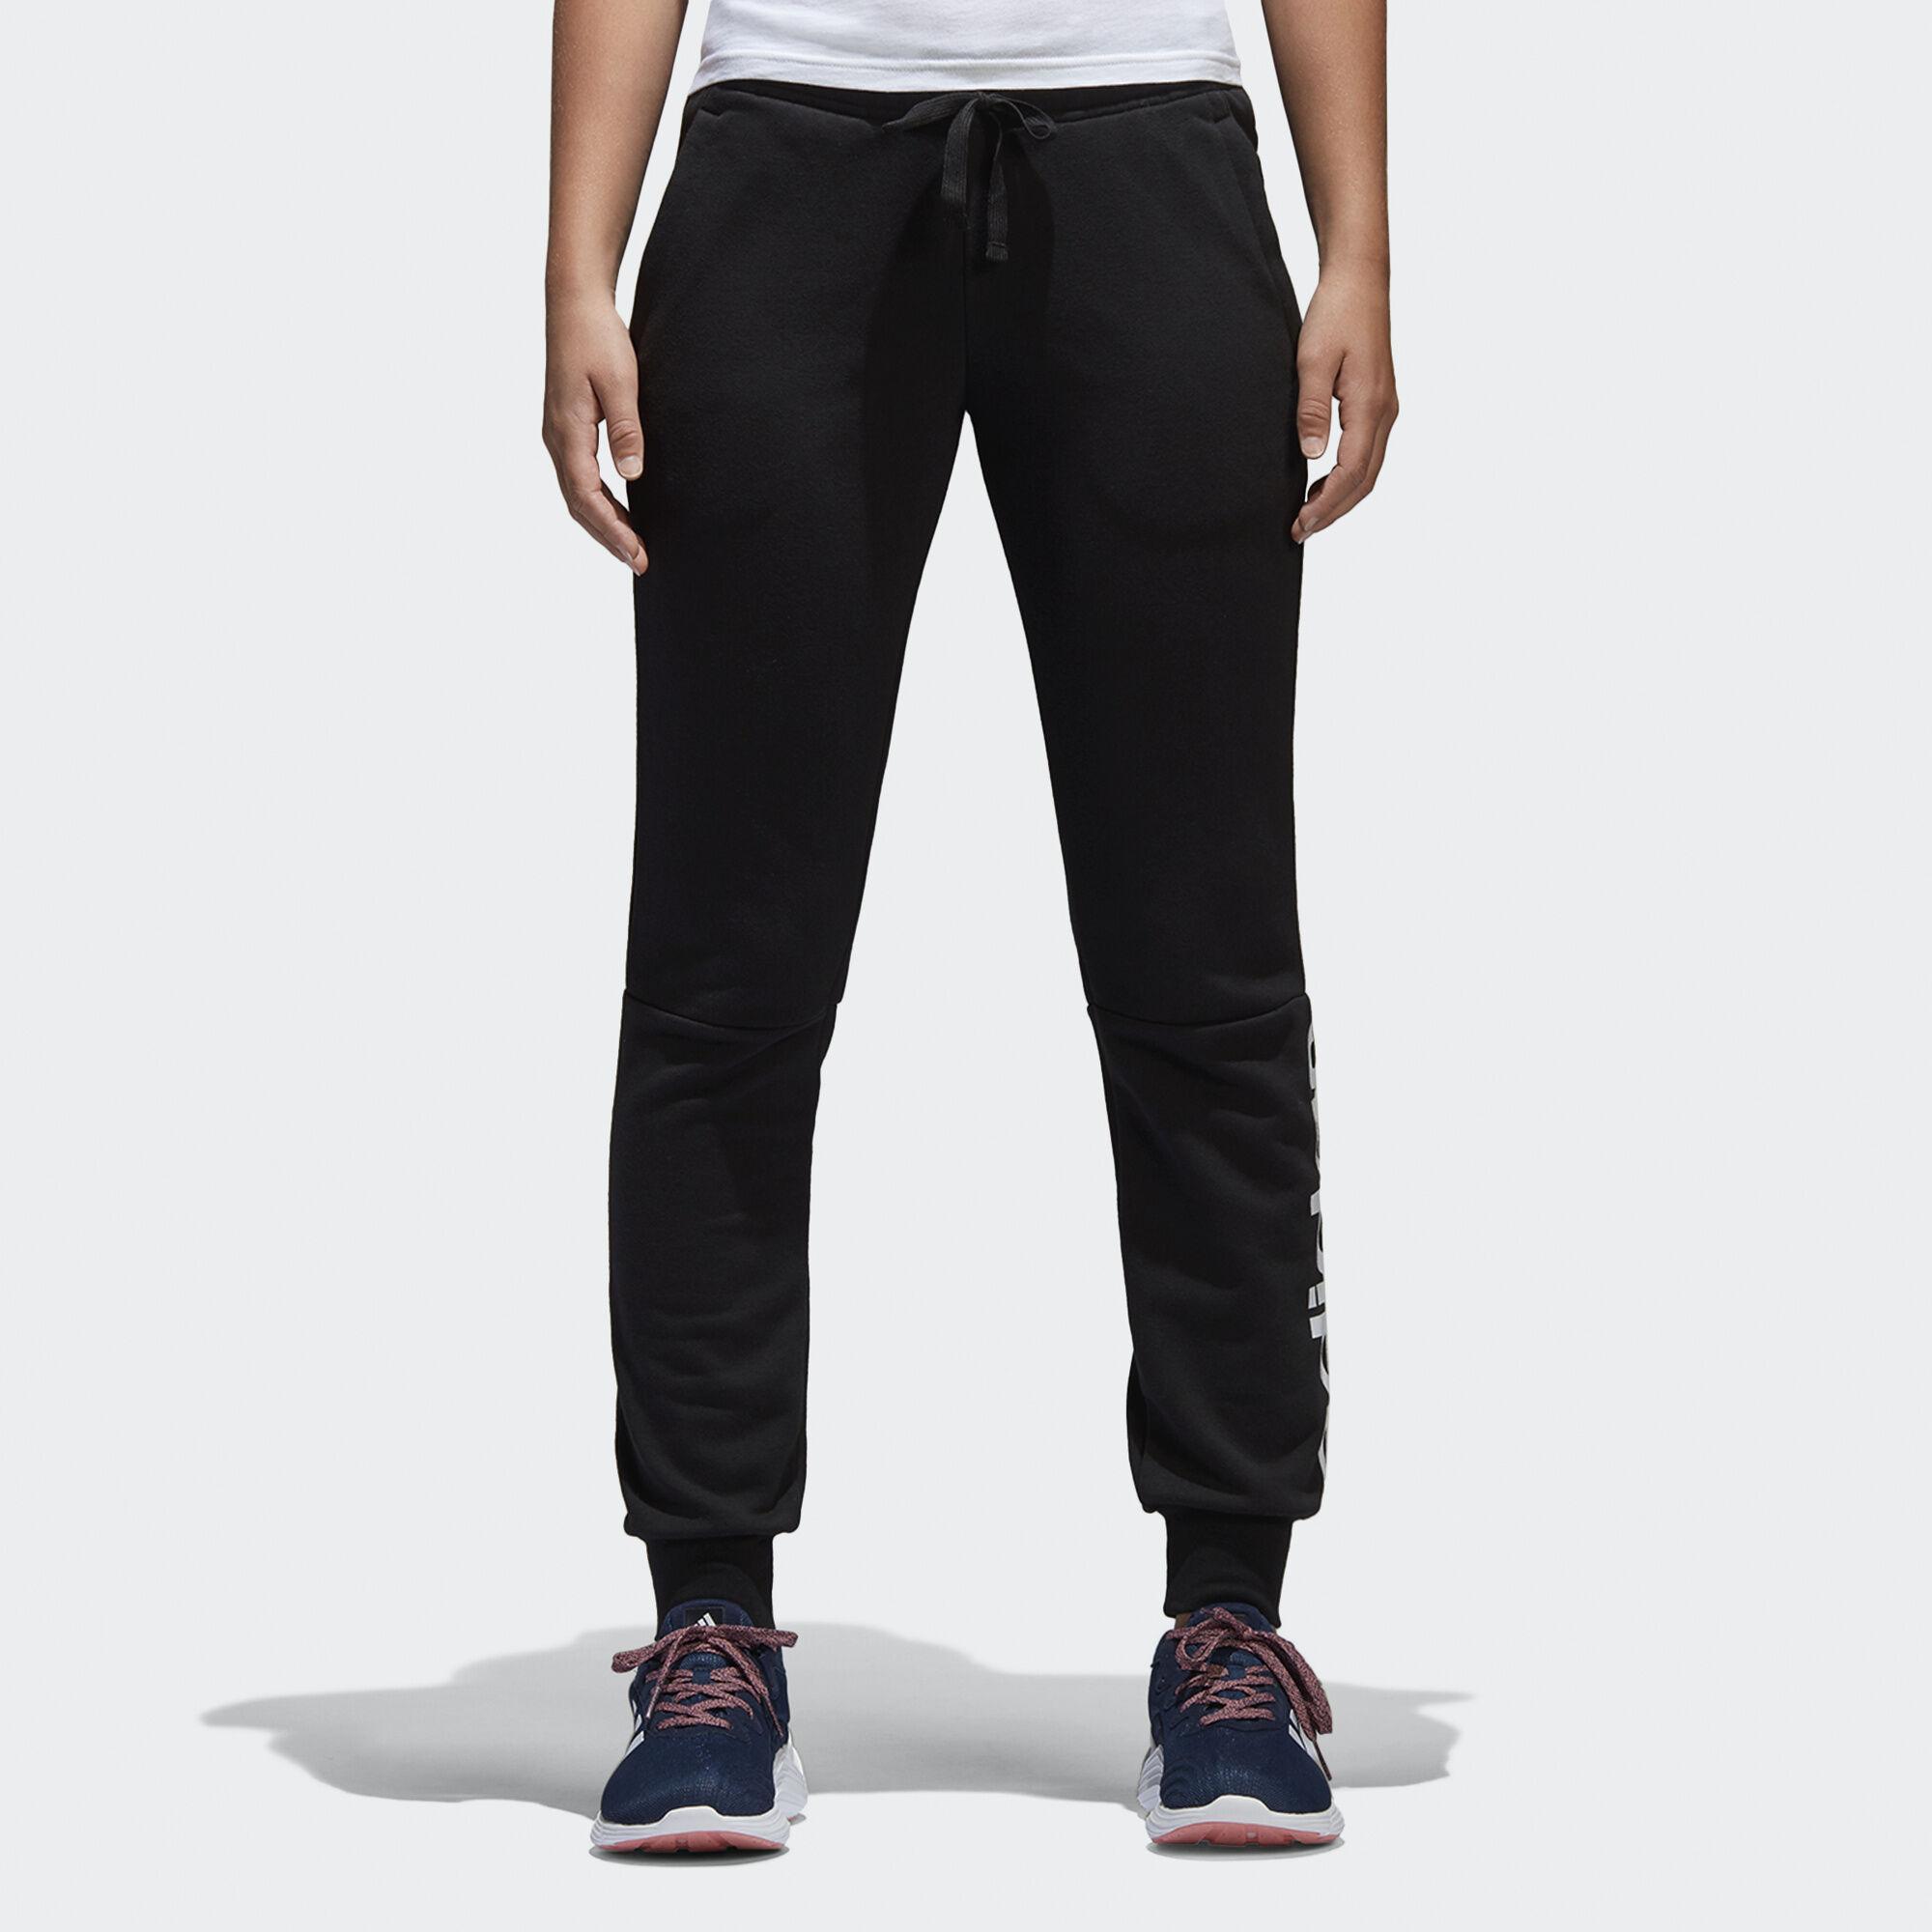 223e2c19ed15e5 adidas essential yoga pants